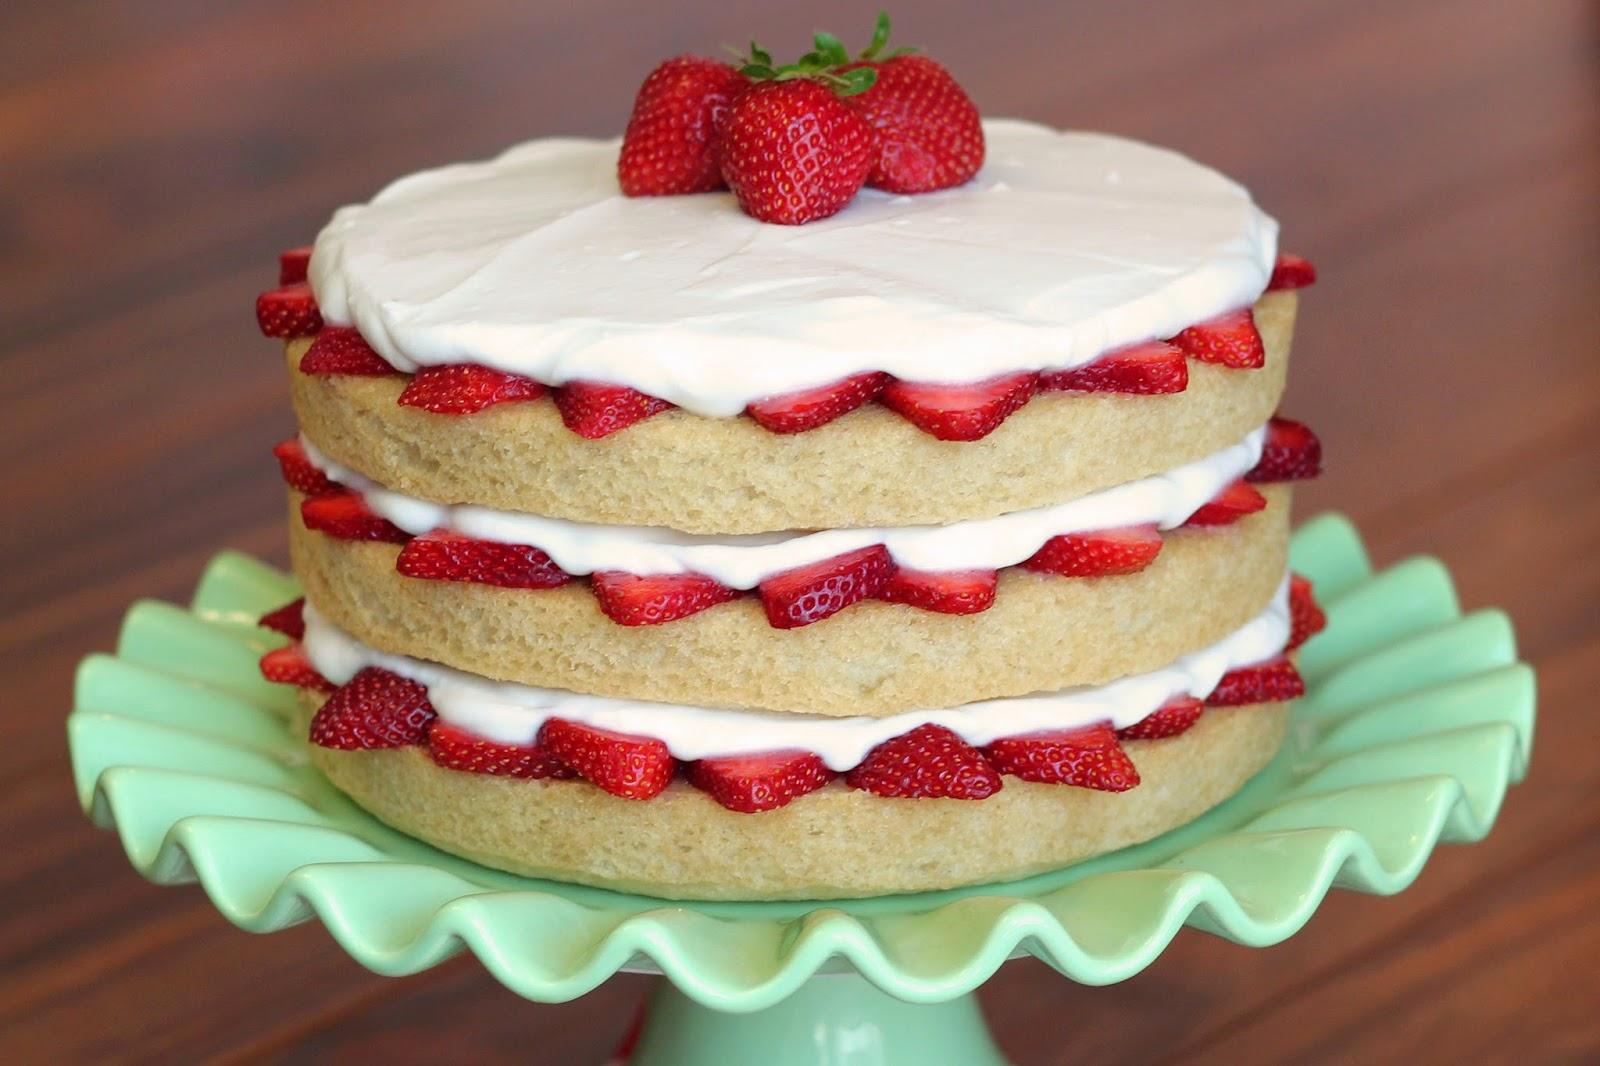 Best Gluten Free Vegan Vanilla Cake